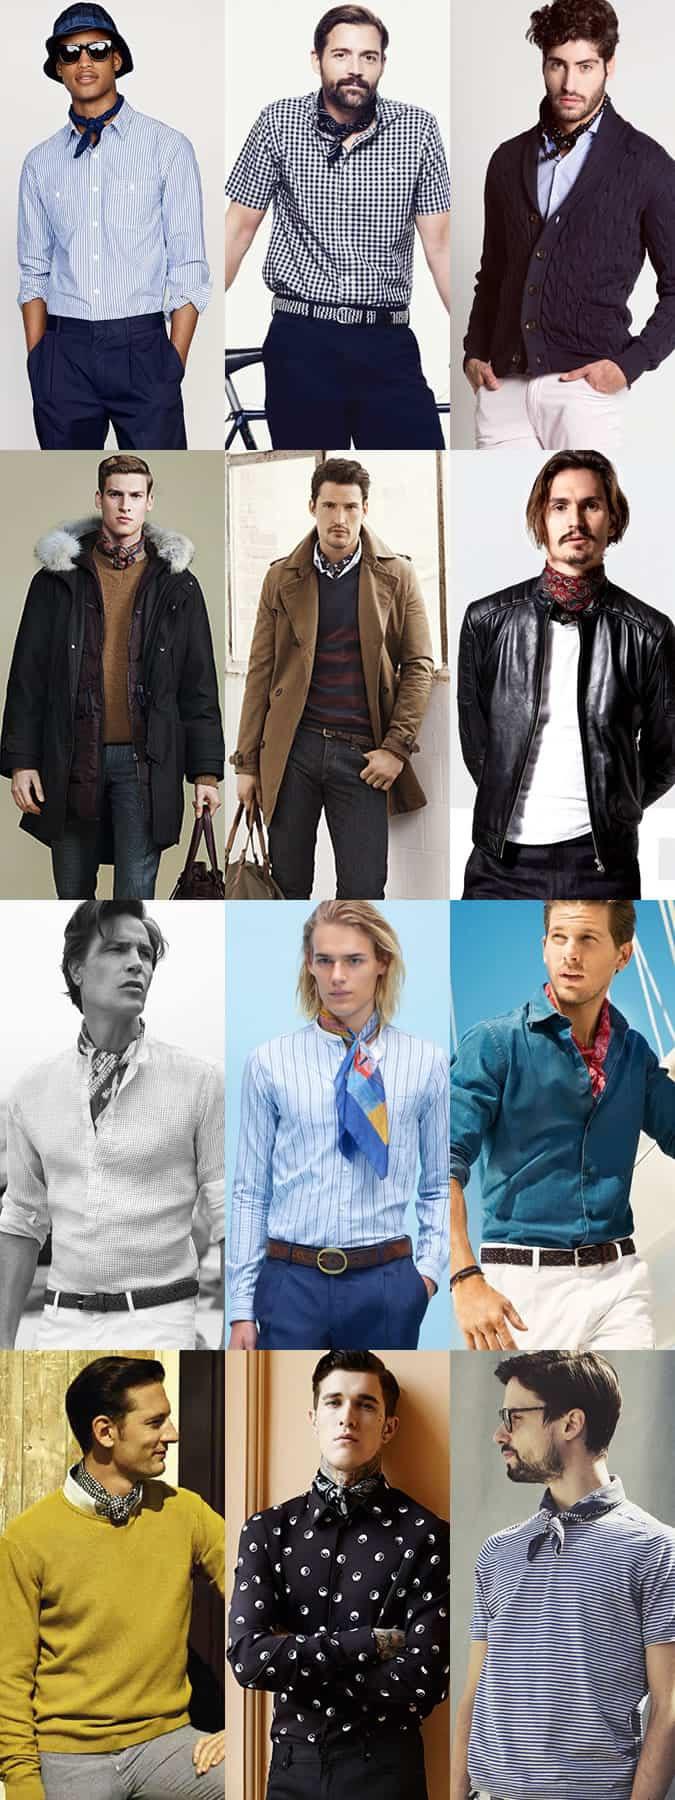 Men's Lightweight Scarves and Neckerchiefs Outfit Inspiration Lookbook